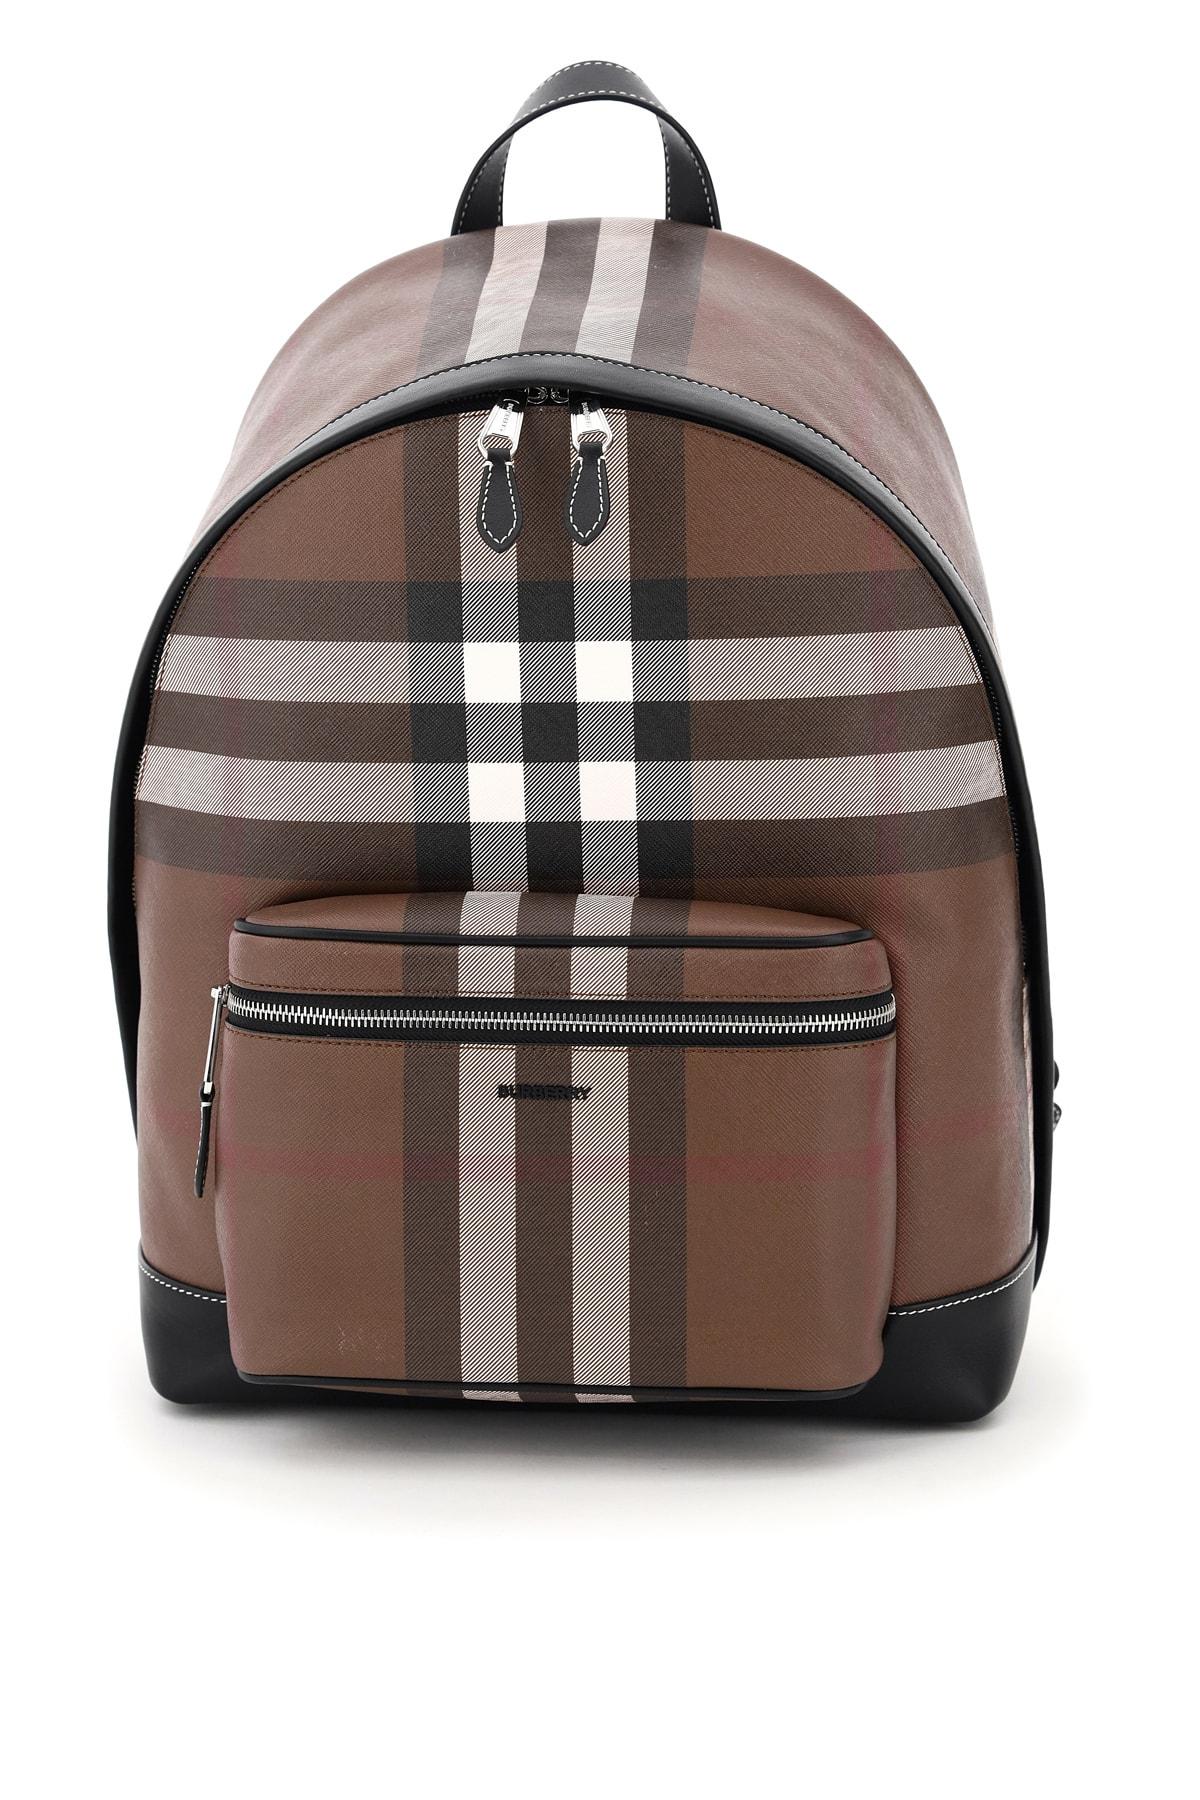 Burberry Jett Tartan Backpack In Check Marrone